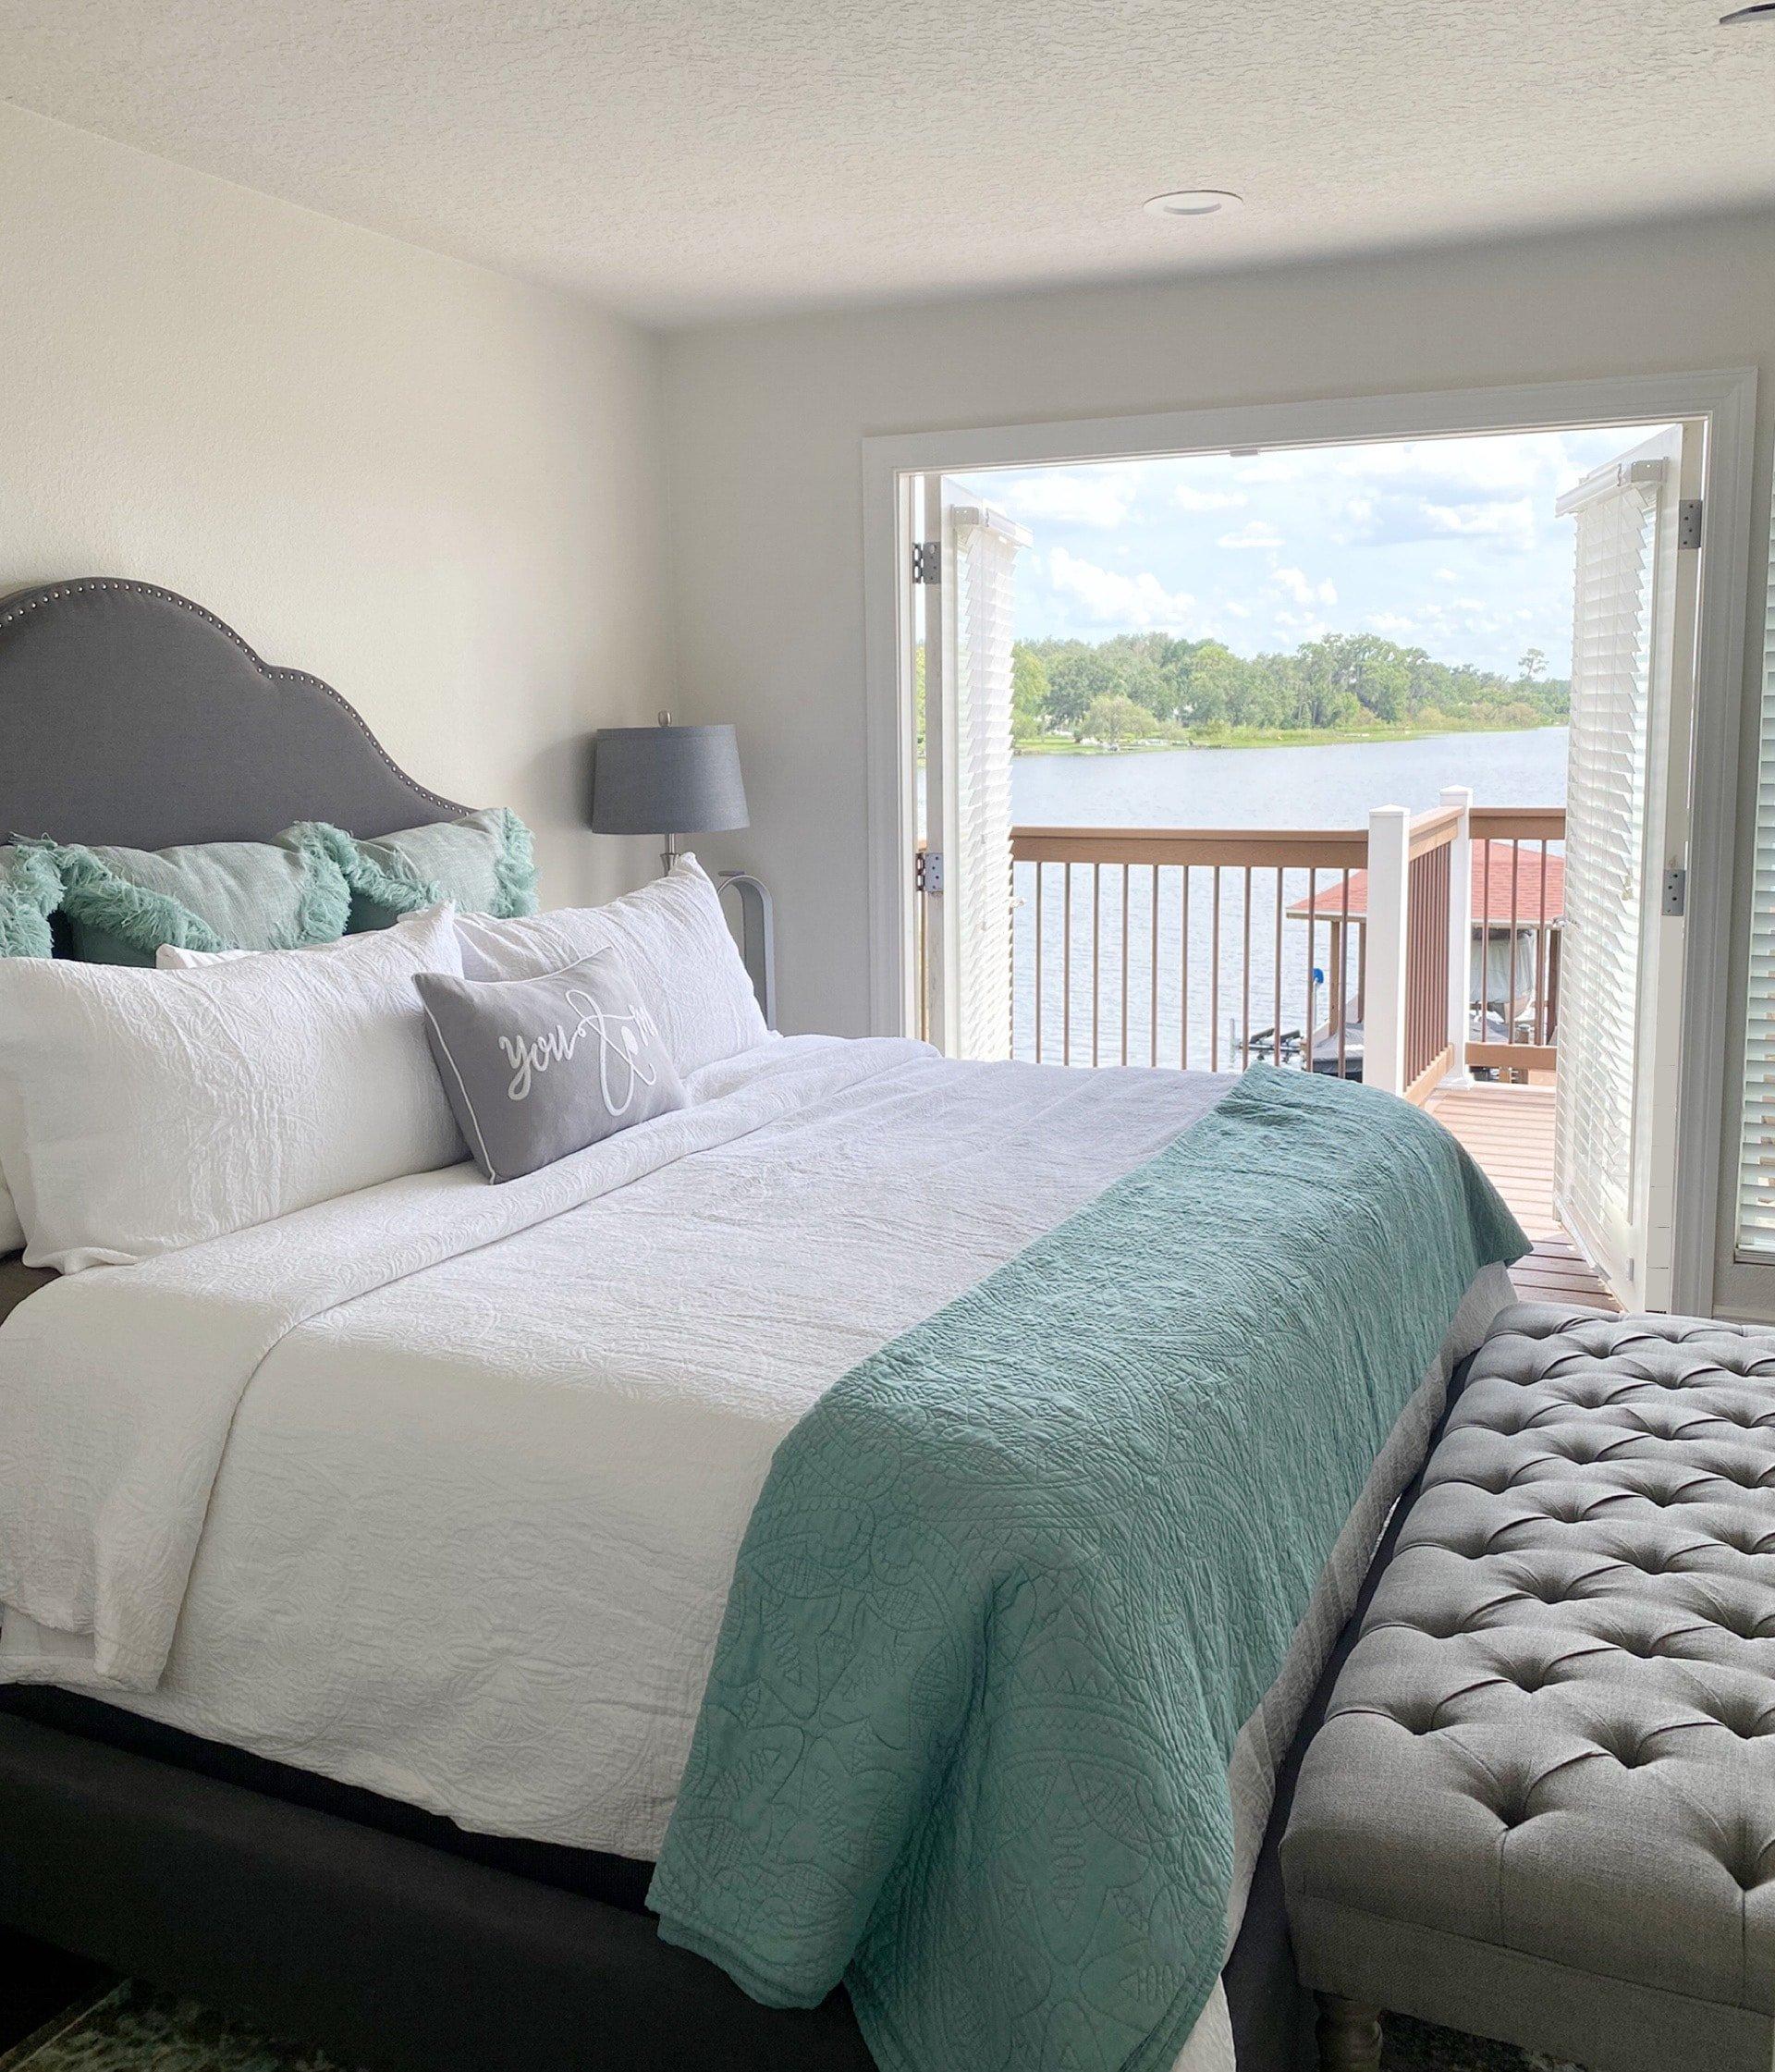 lake house master bedroom decor ideas